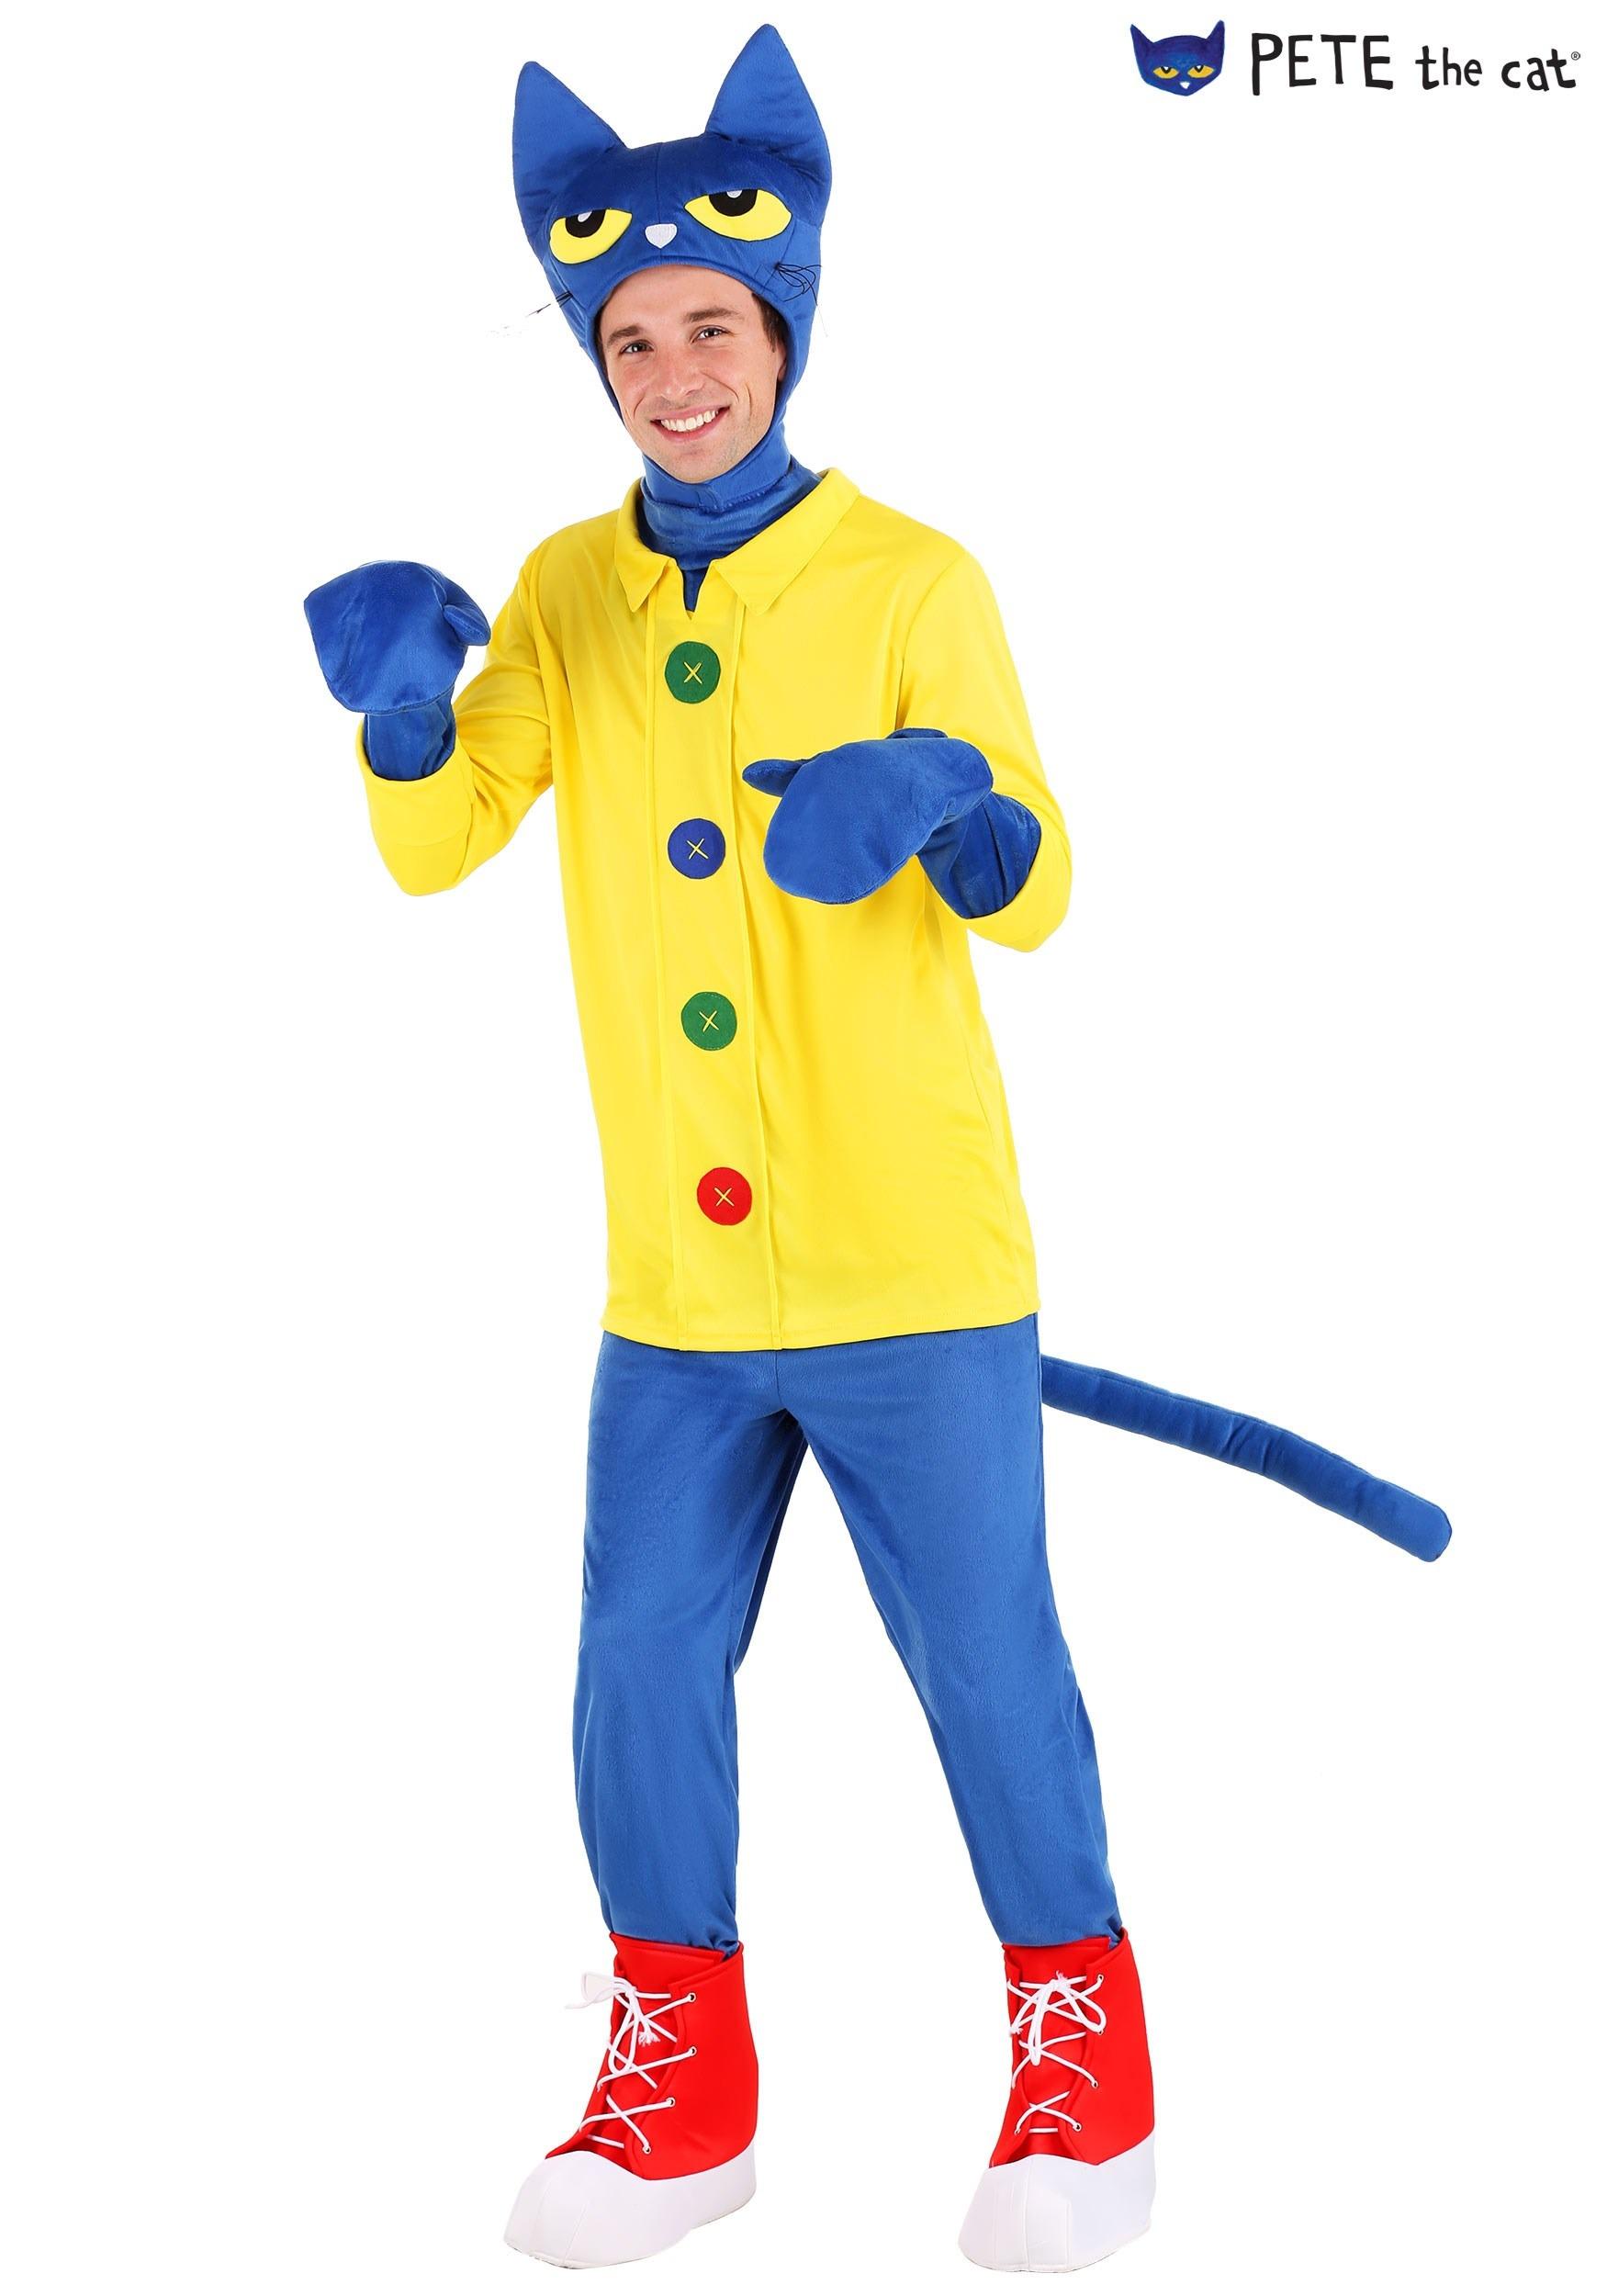 Pete the Cat Adult Costume